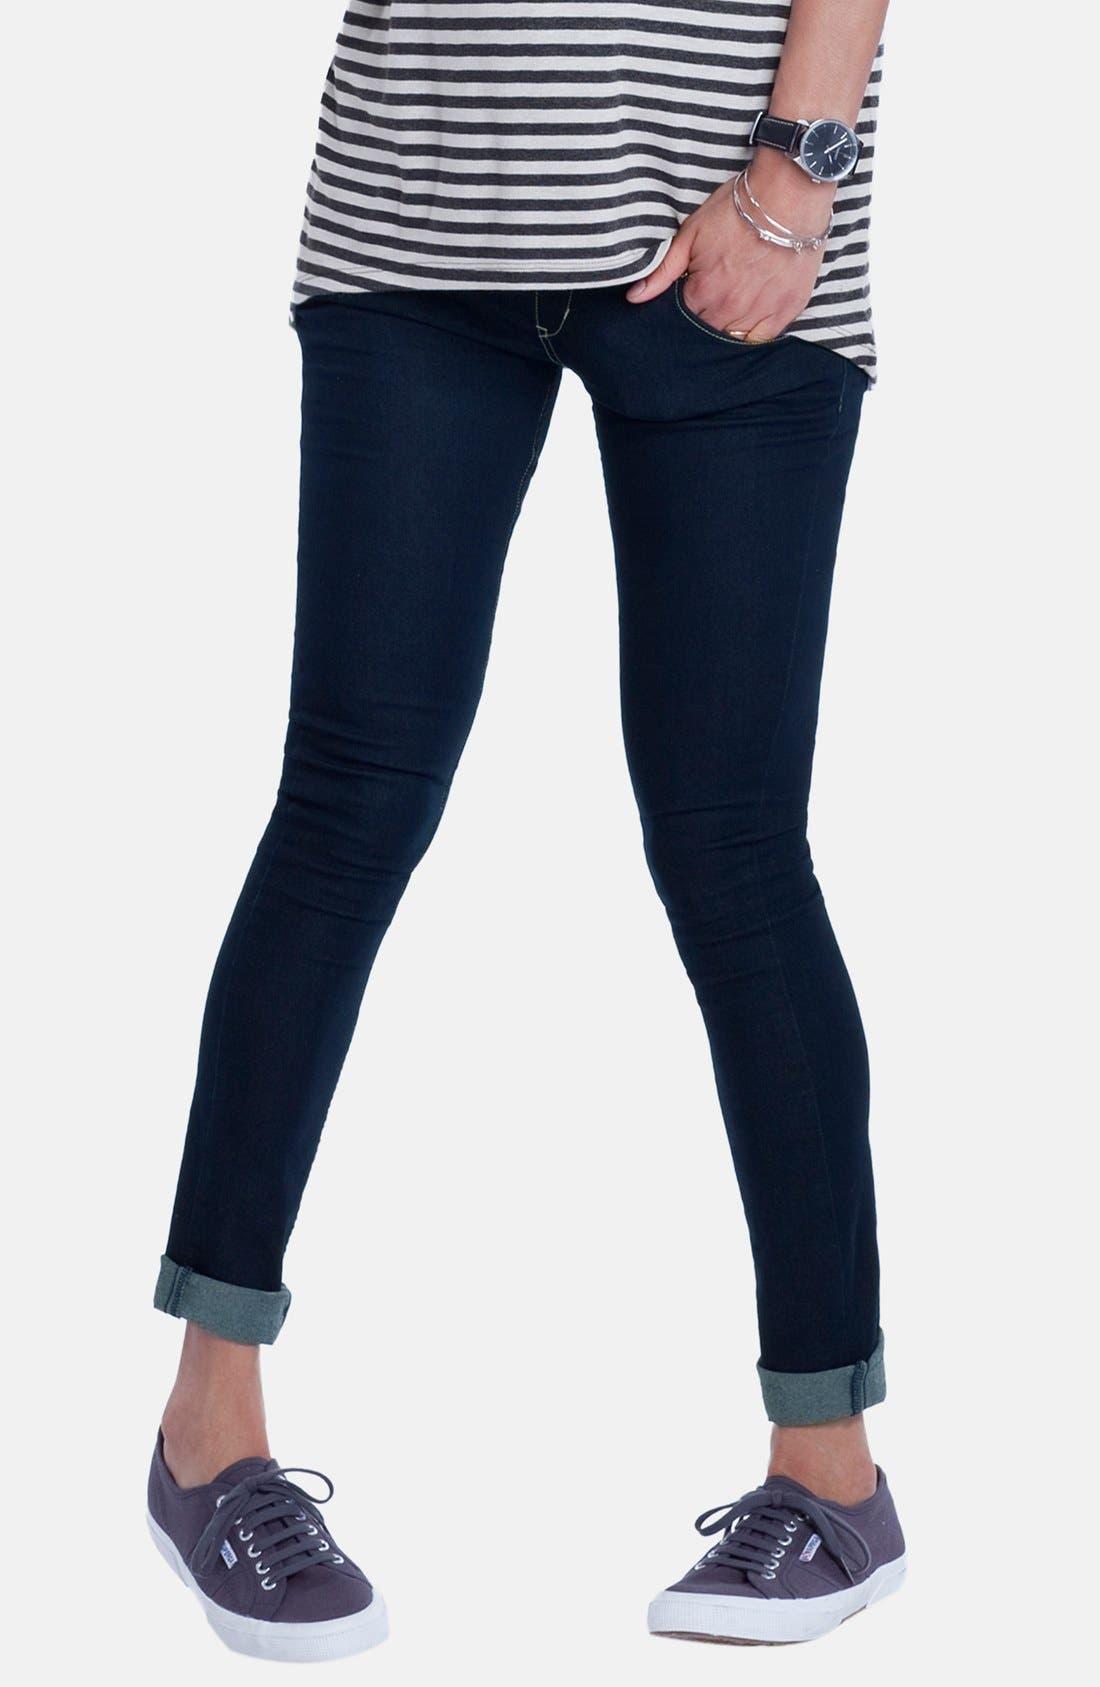 'Zadie' Stretch Maternity Skinny Jeans,                         Main,                         color, Indigo